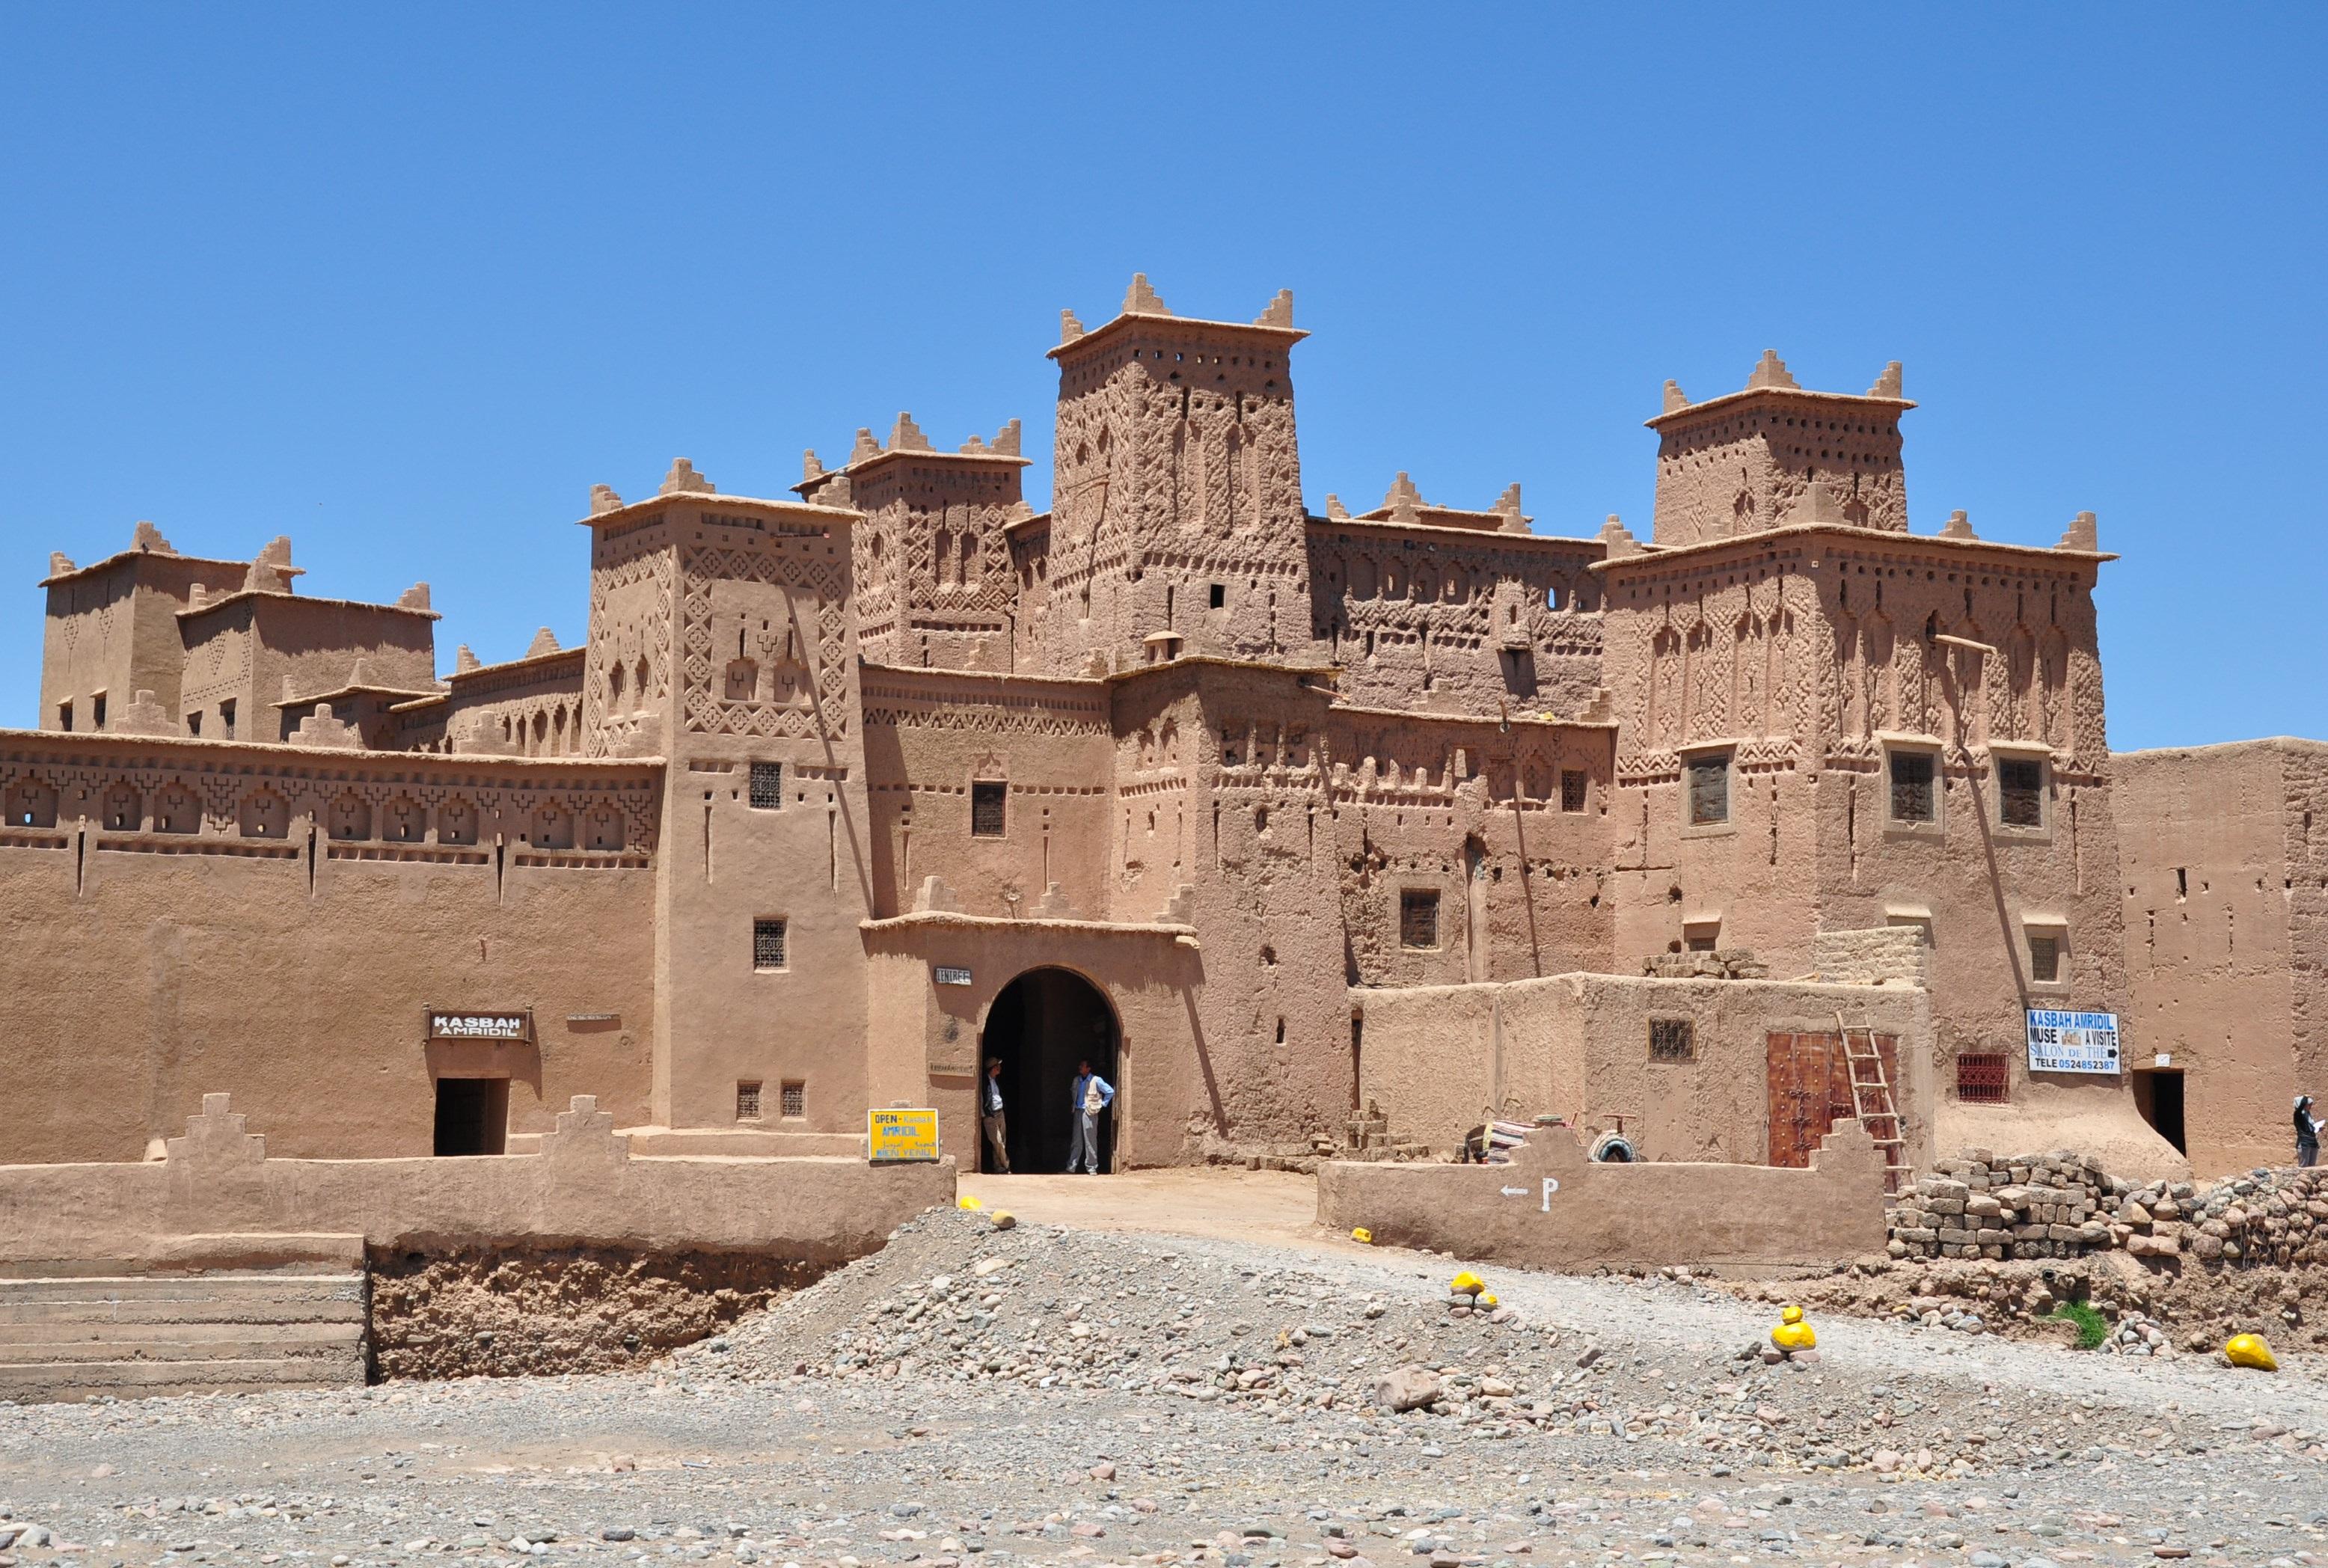 Ouarzazate Morocco  city photo : Morocco, Souss Massa Draa Region, Ouarzazate Province, Skoura ...